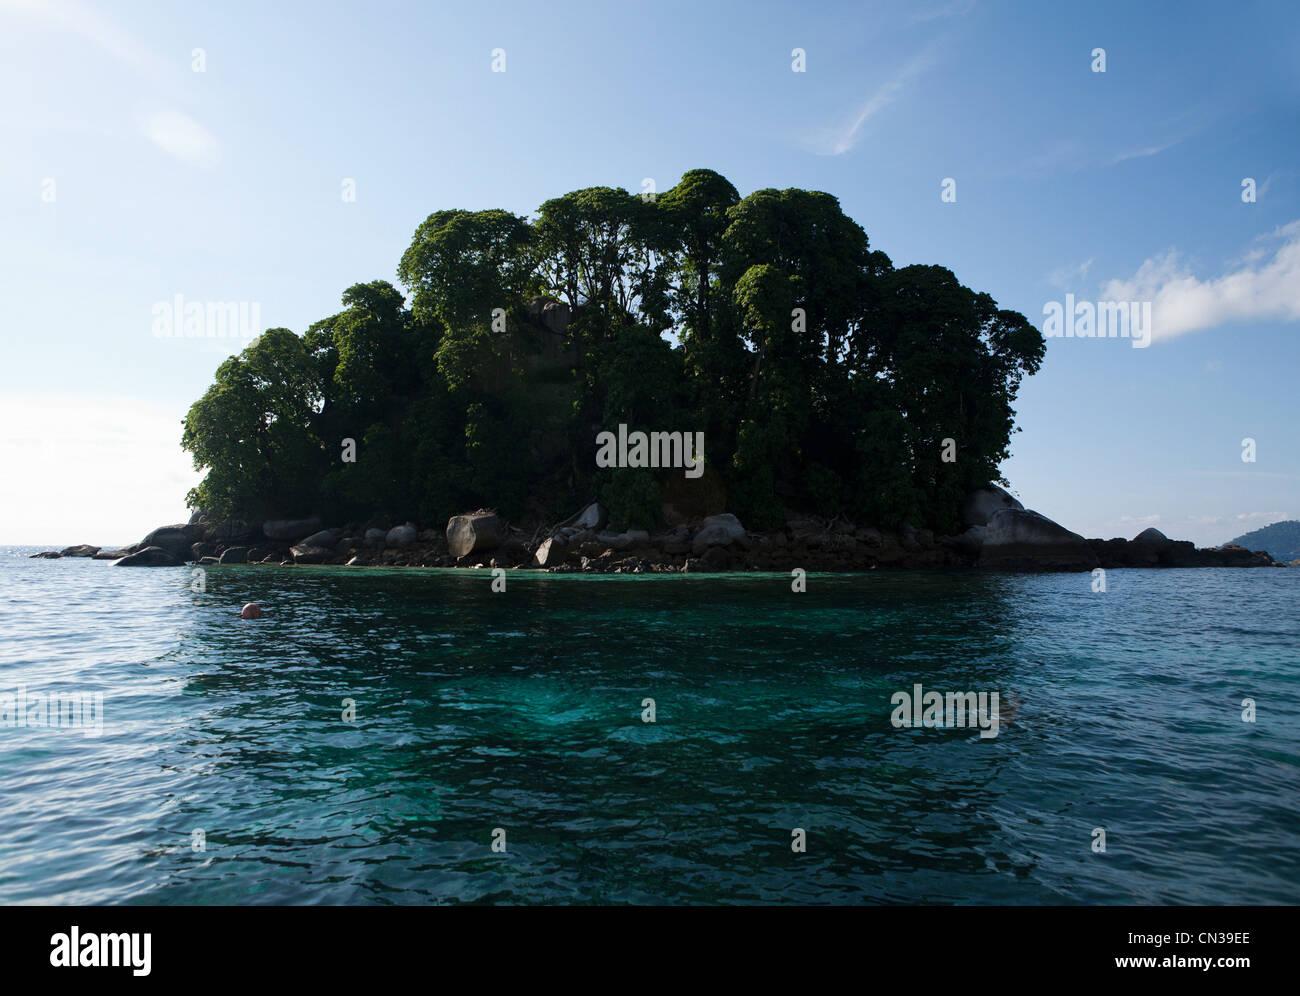 Small island in South China Sea near Tioman Island, Malaysia - Stock Image